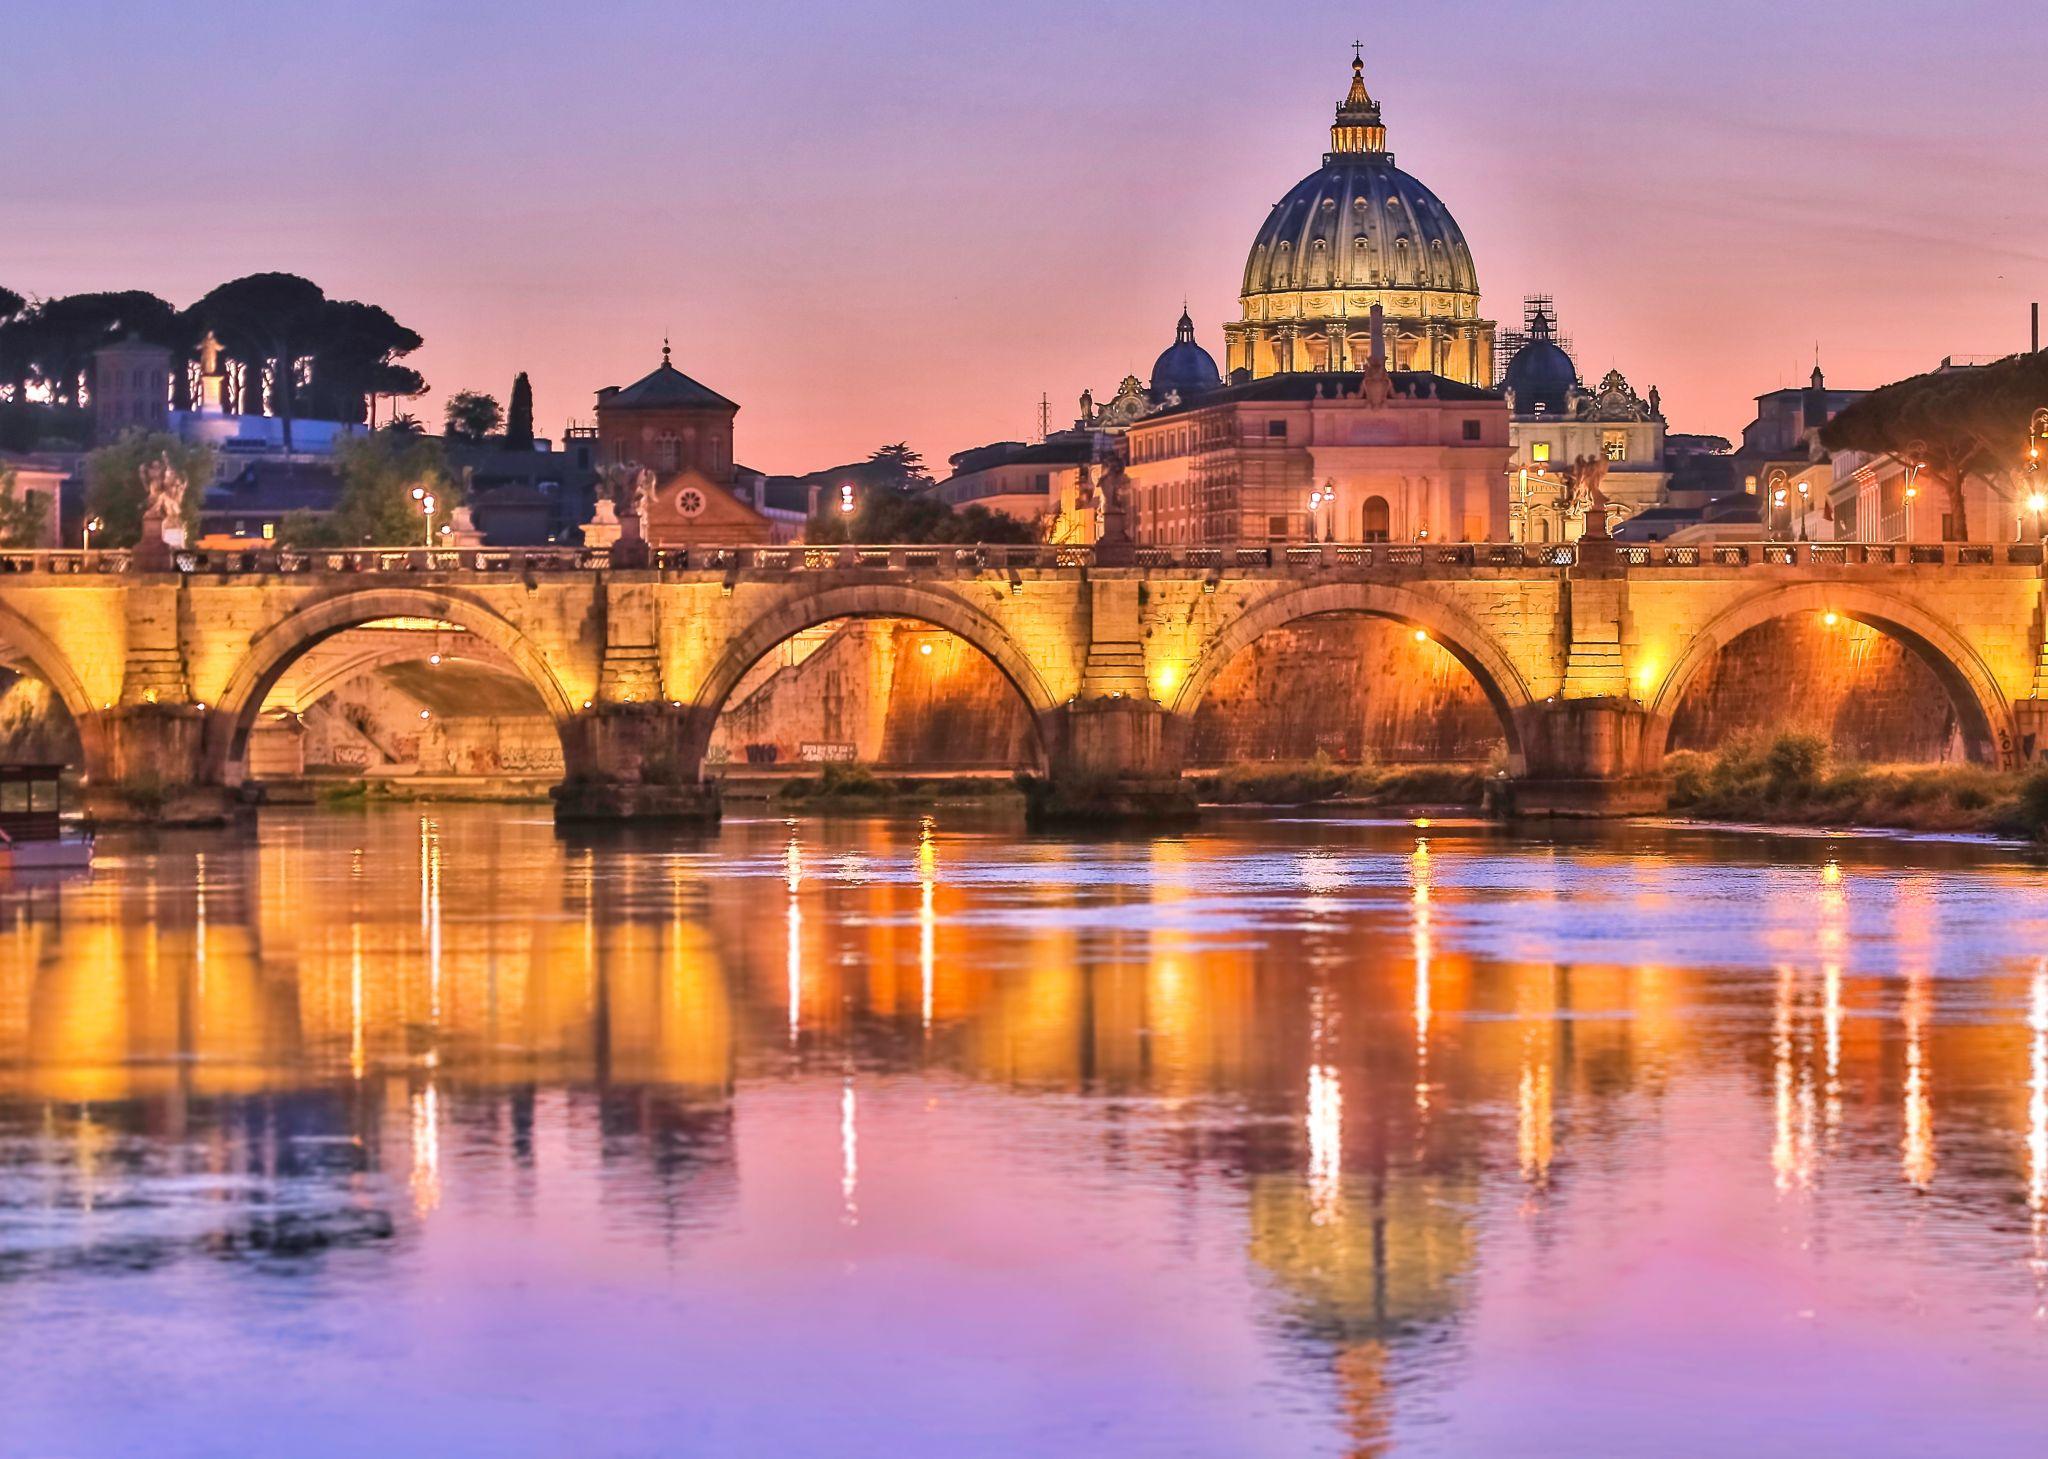 Basilica, Italy